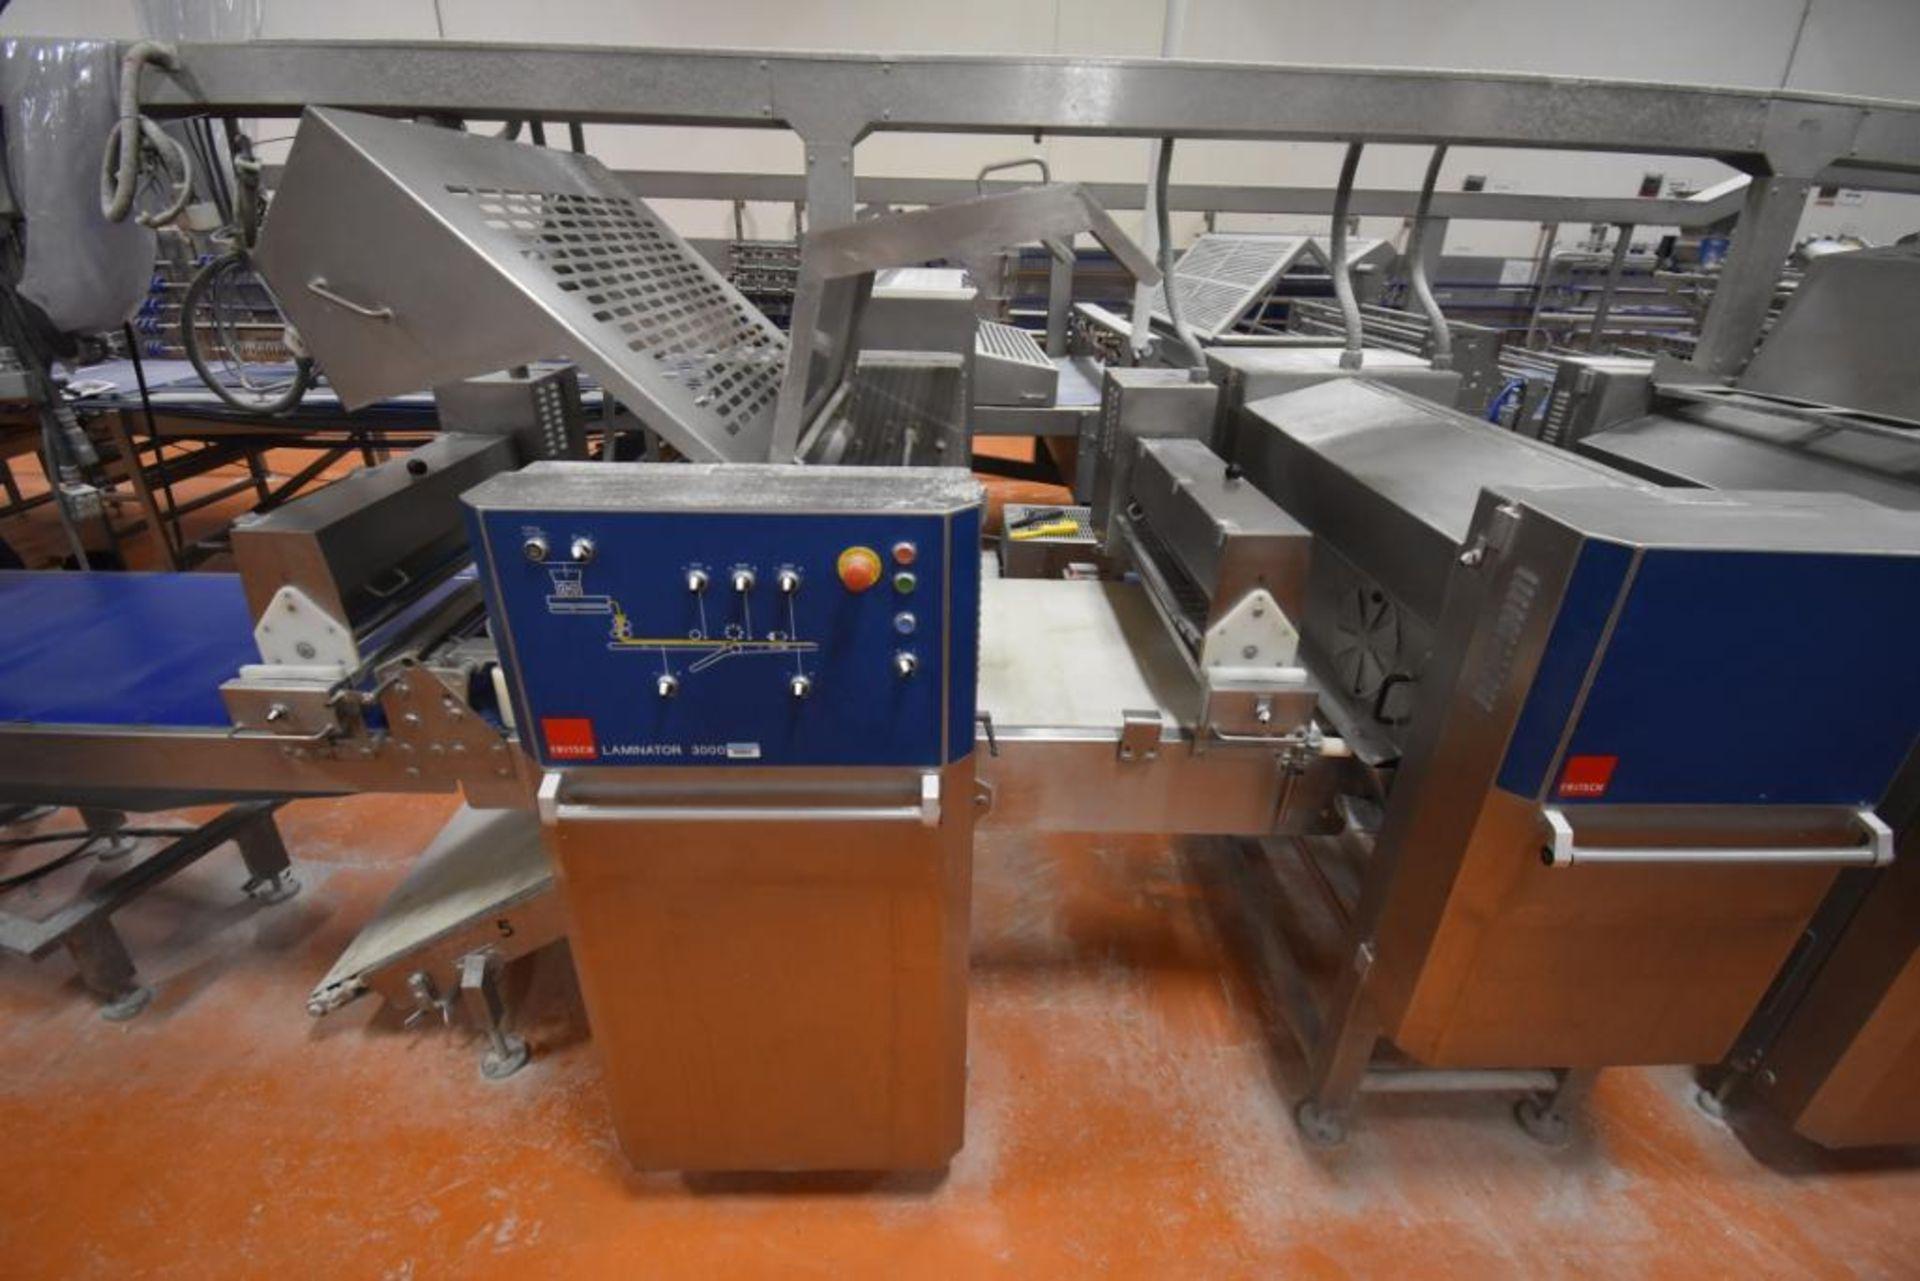 2007 Fritsch Laminator 3000 dough line - Image 263 of 280